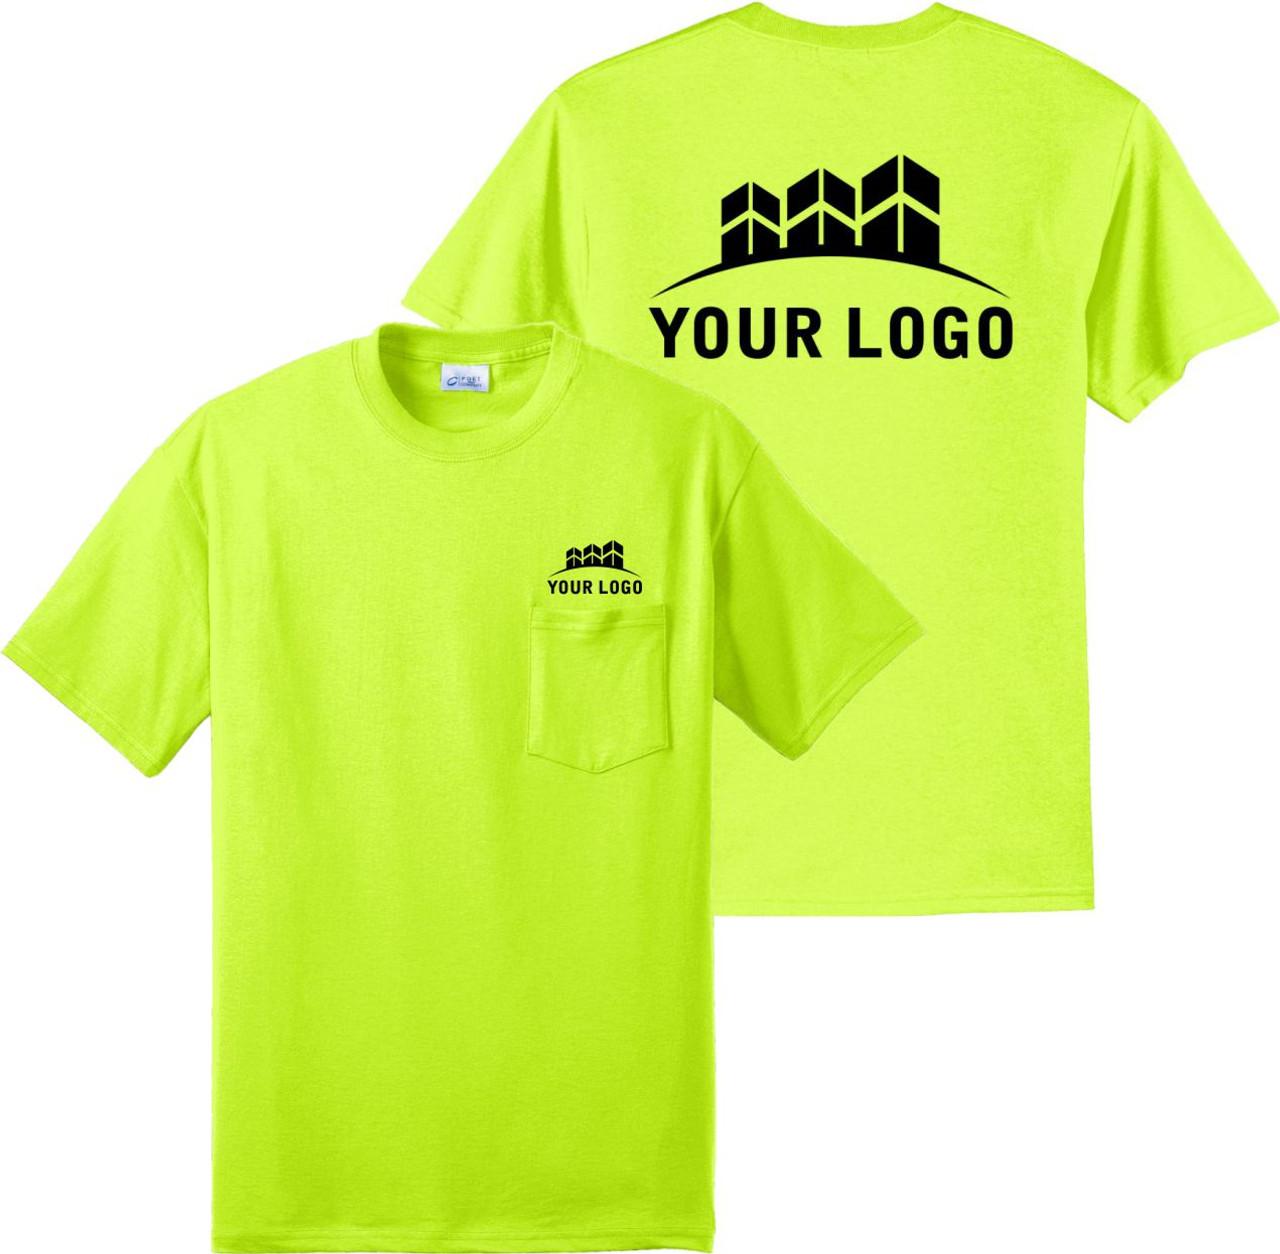 Safety Green Short Sleeve Pocket T Shirt front and back custom printed logo